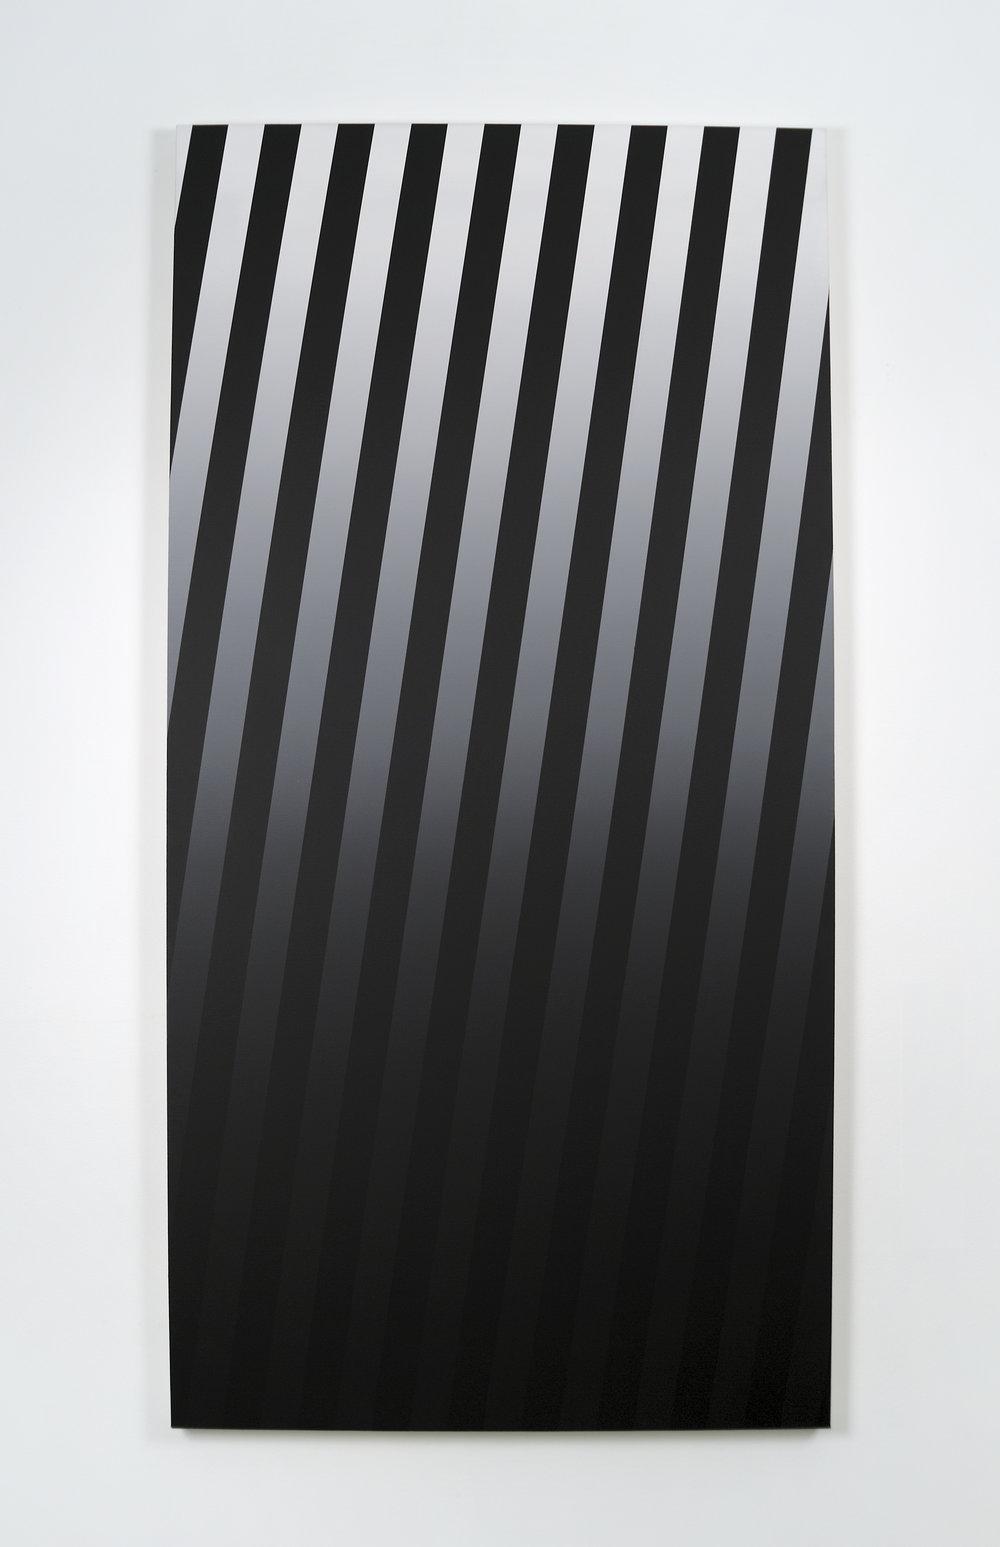 Gradient, 2010 acrylic on canvas 180 x 90 cm - 70 7/8 x 35 3/8 inches